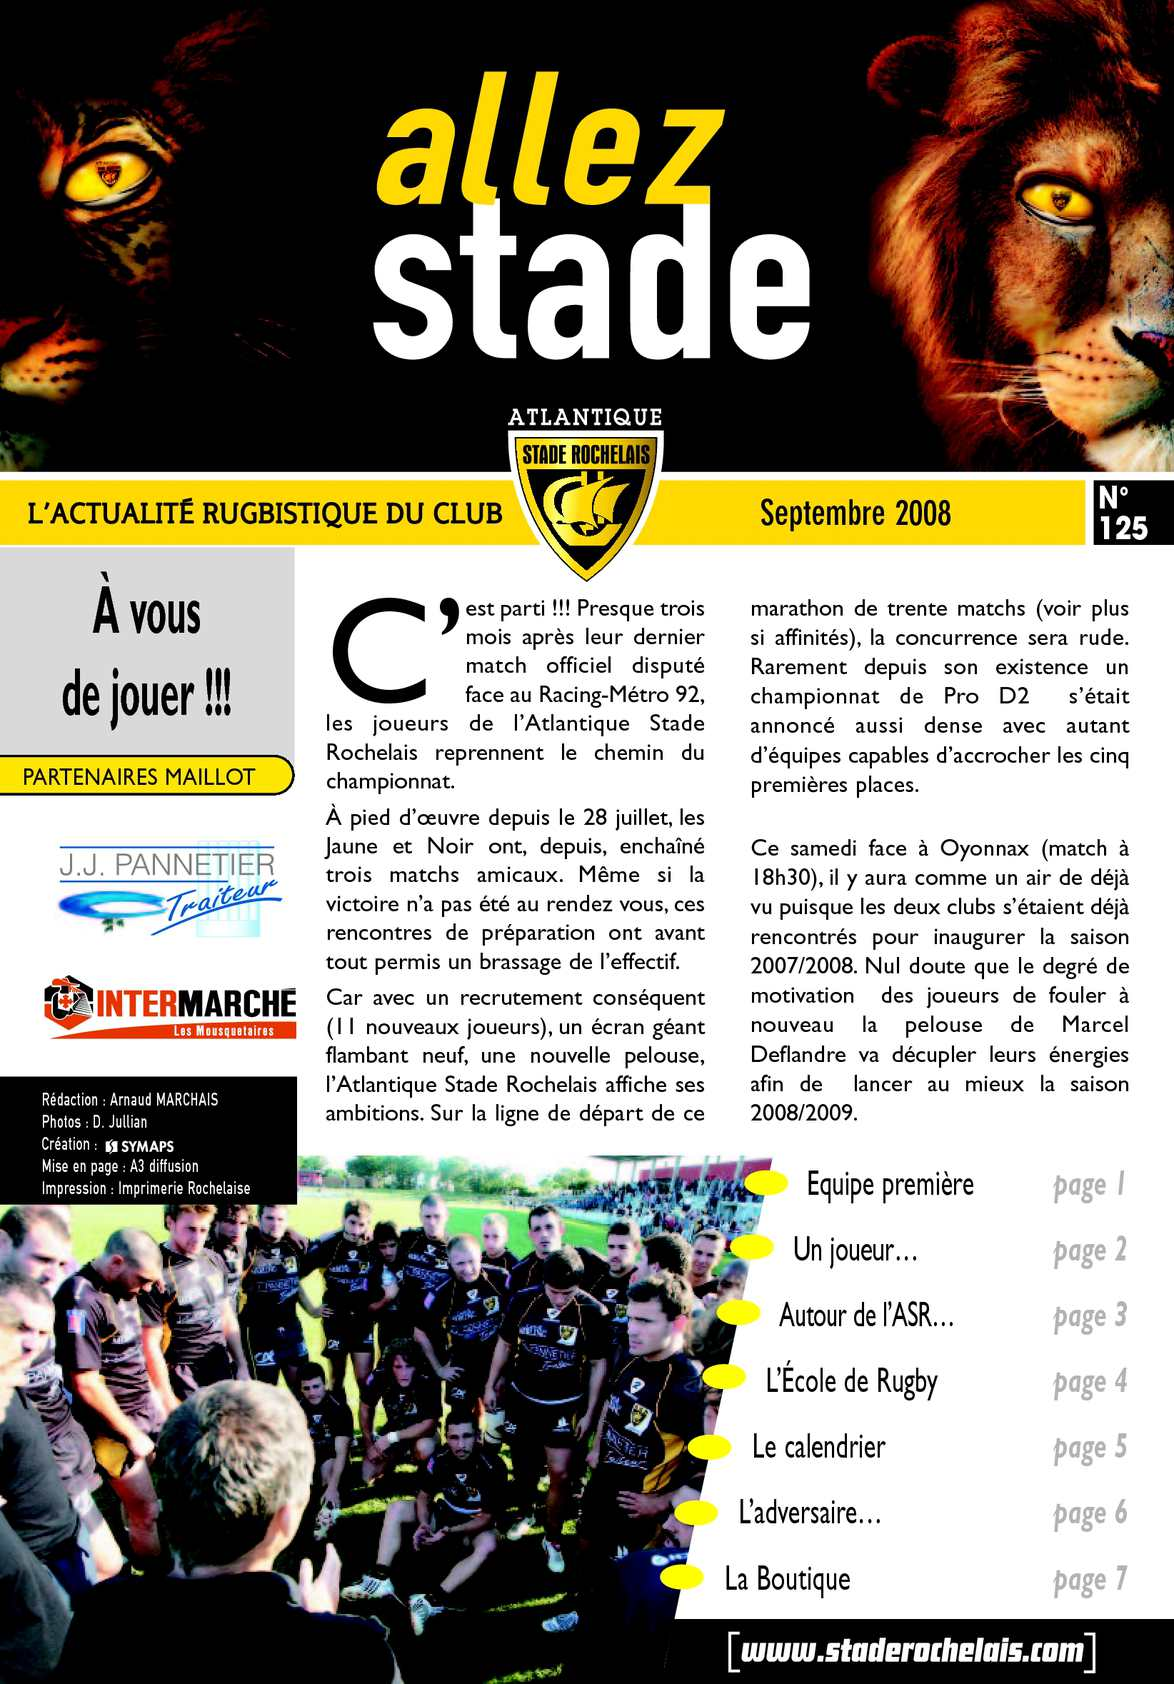 Calaméo - Allez Stade n°125 b3d4f4501c93